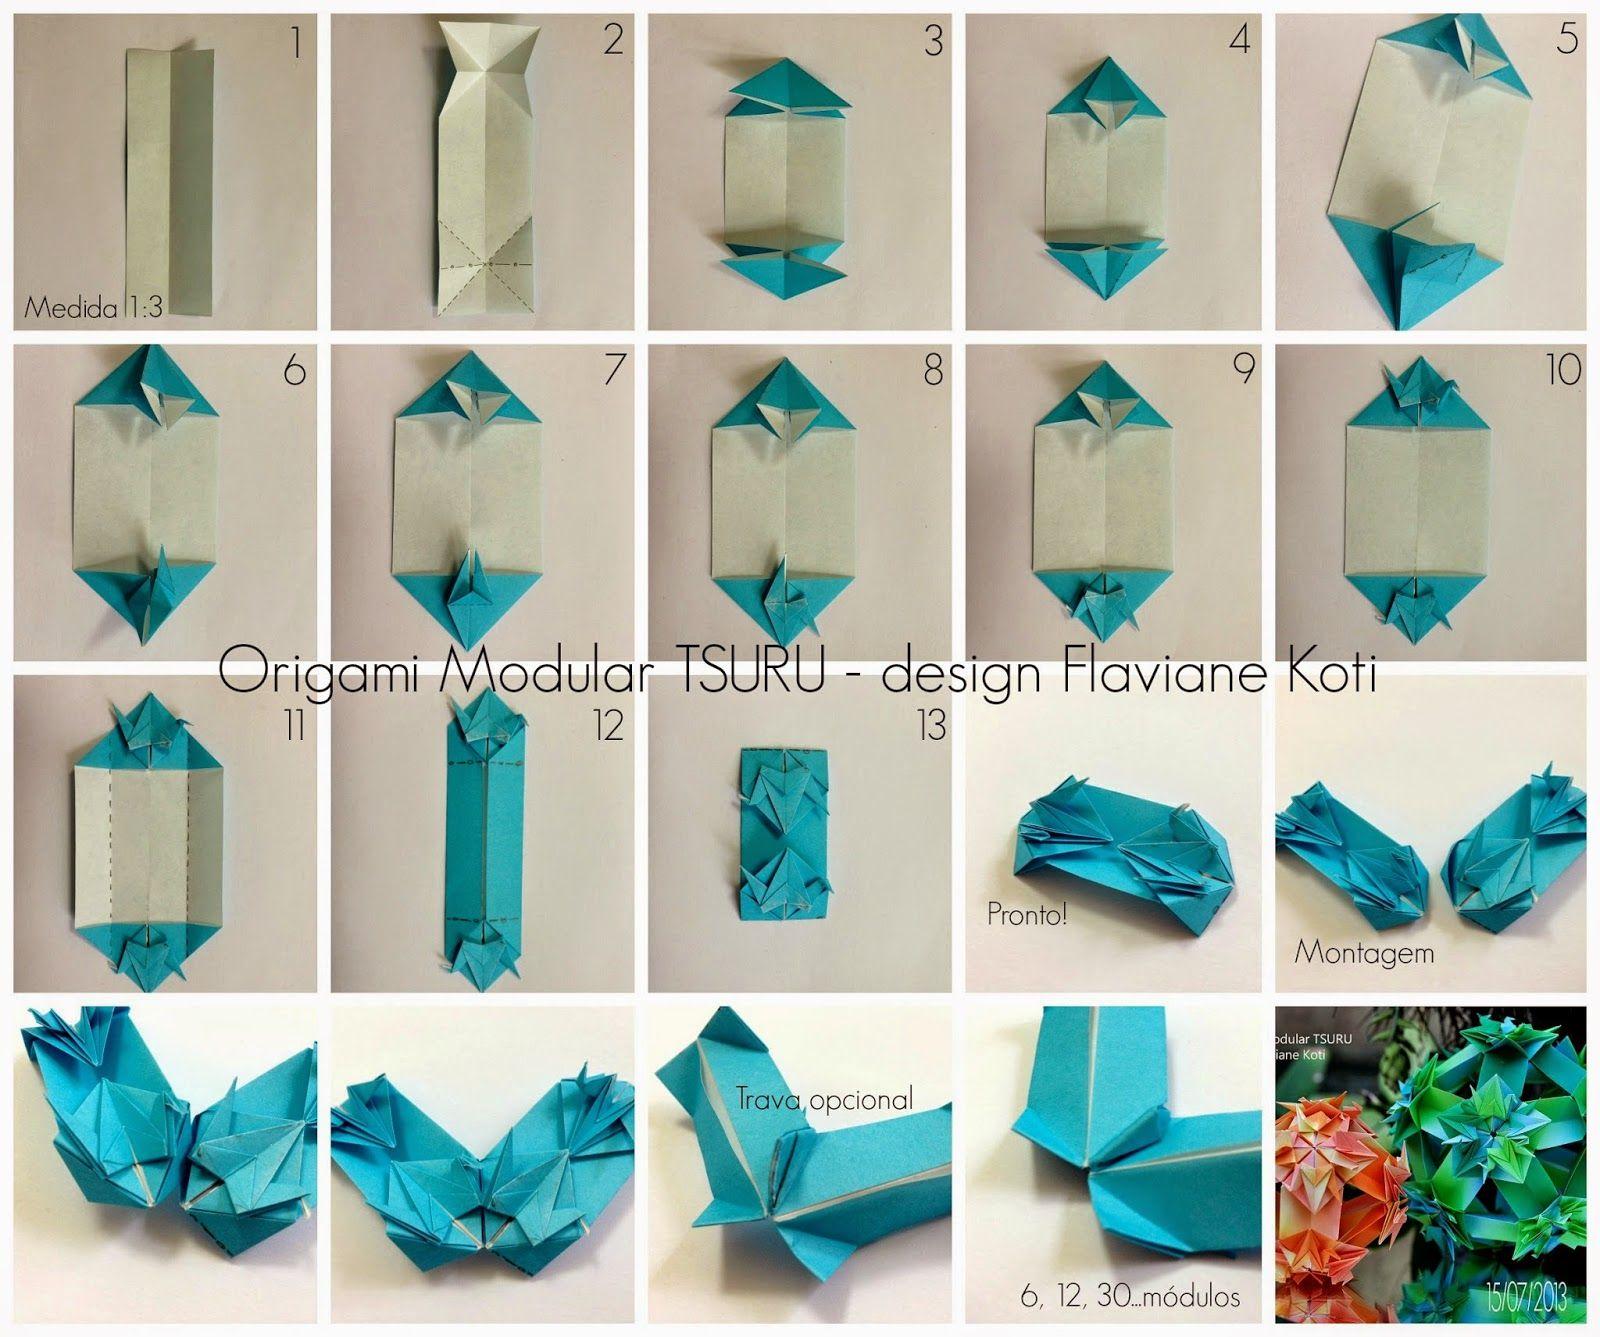 Terapia Do Papel Foto Tutorial Origami Modular Tsuru Curiosidades Kusudama Diagrams Design Flaviane Koti